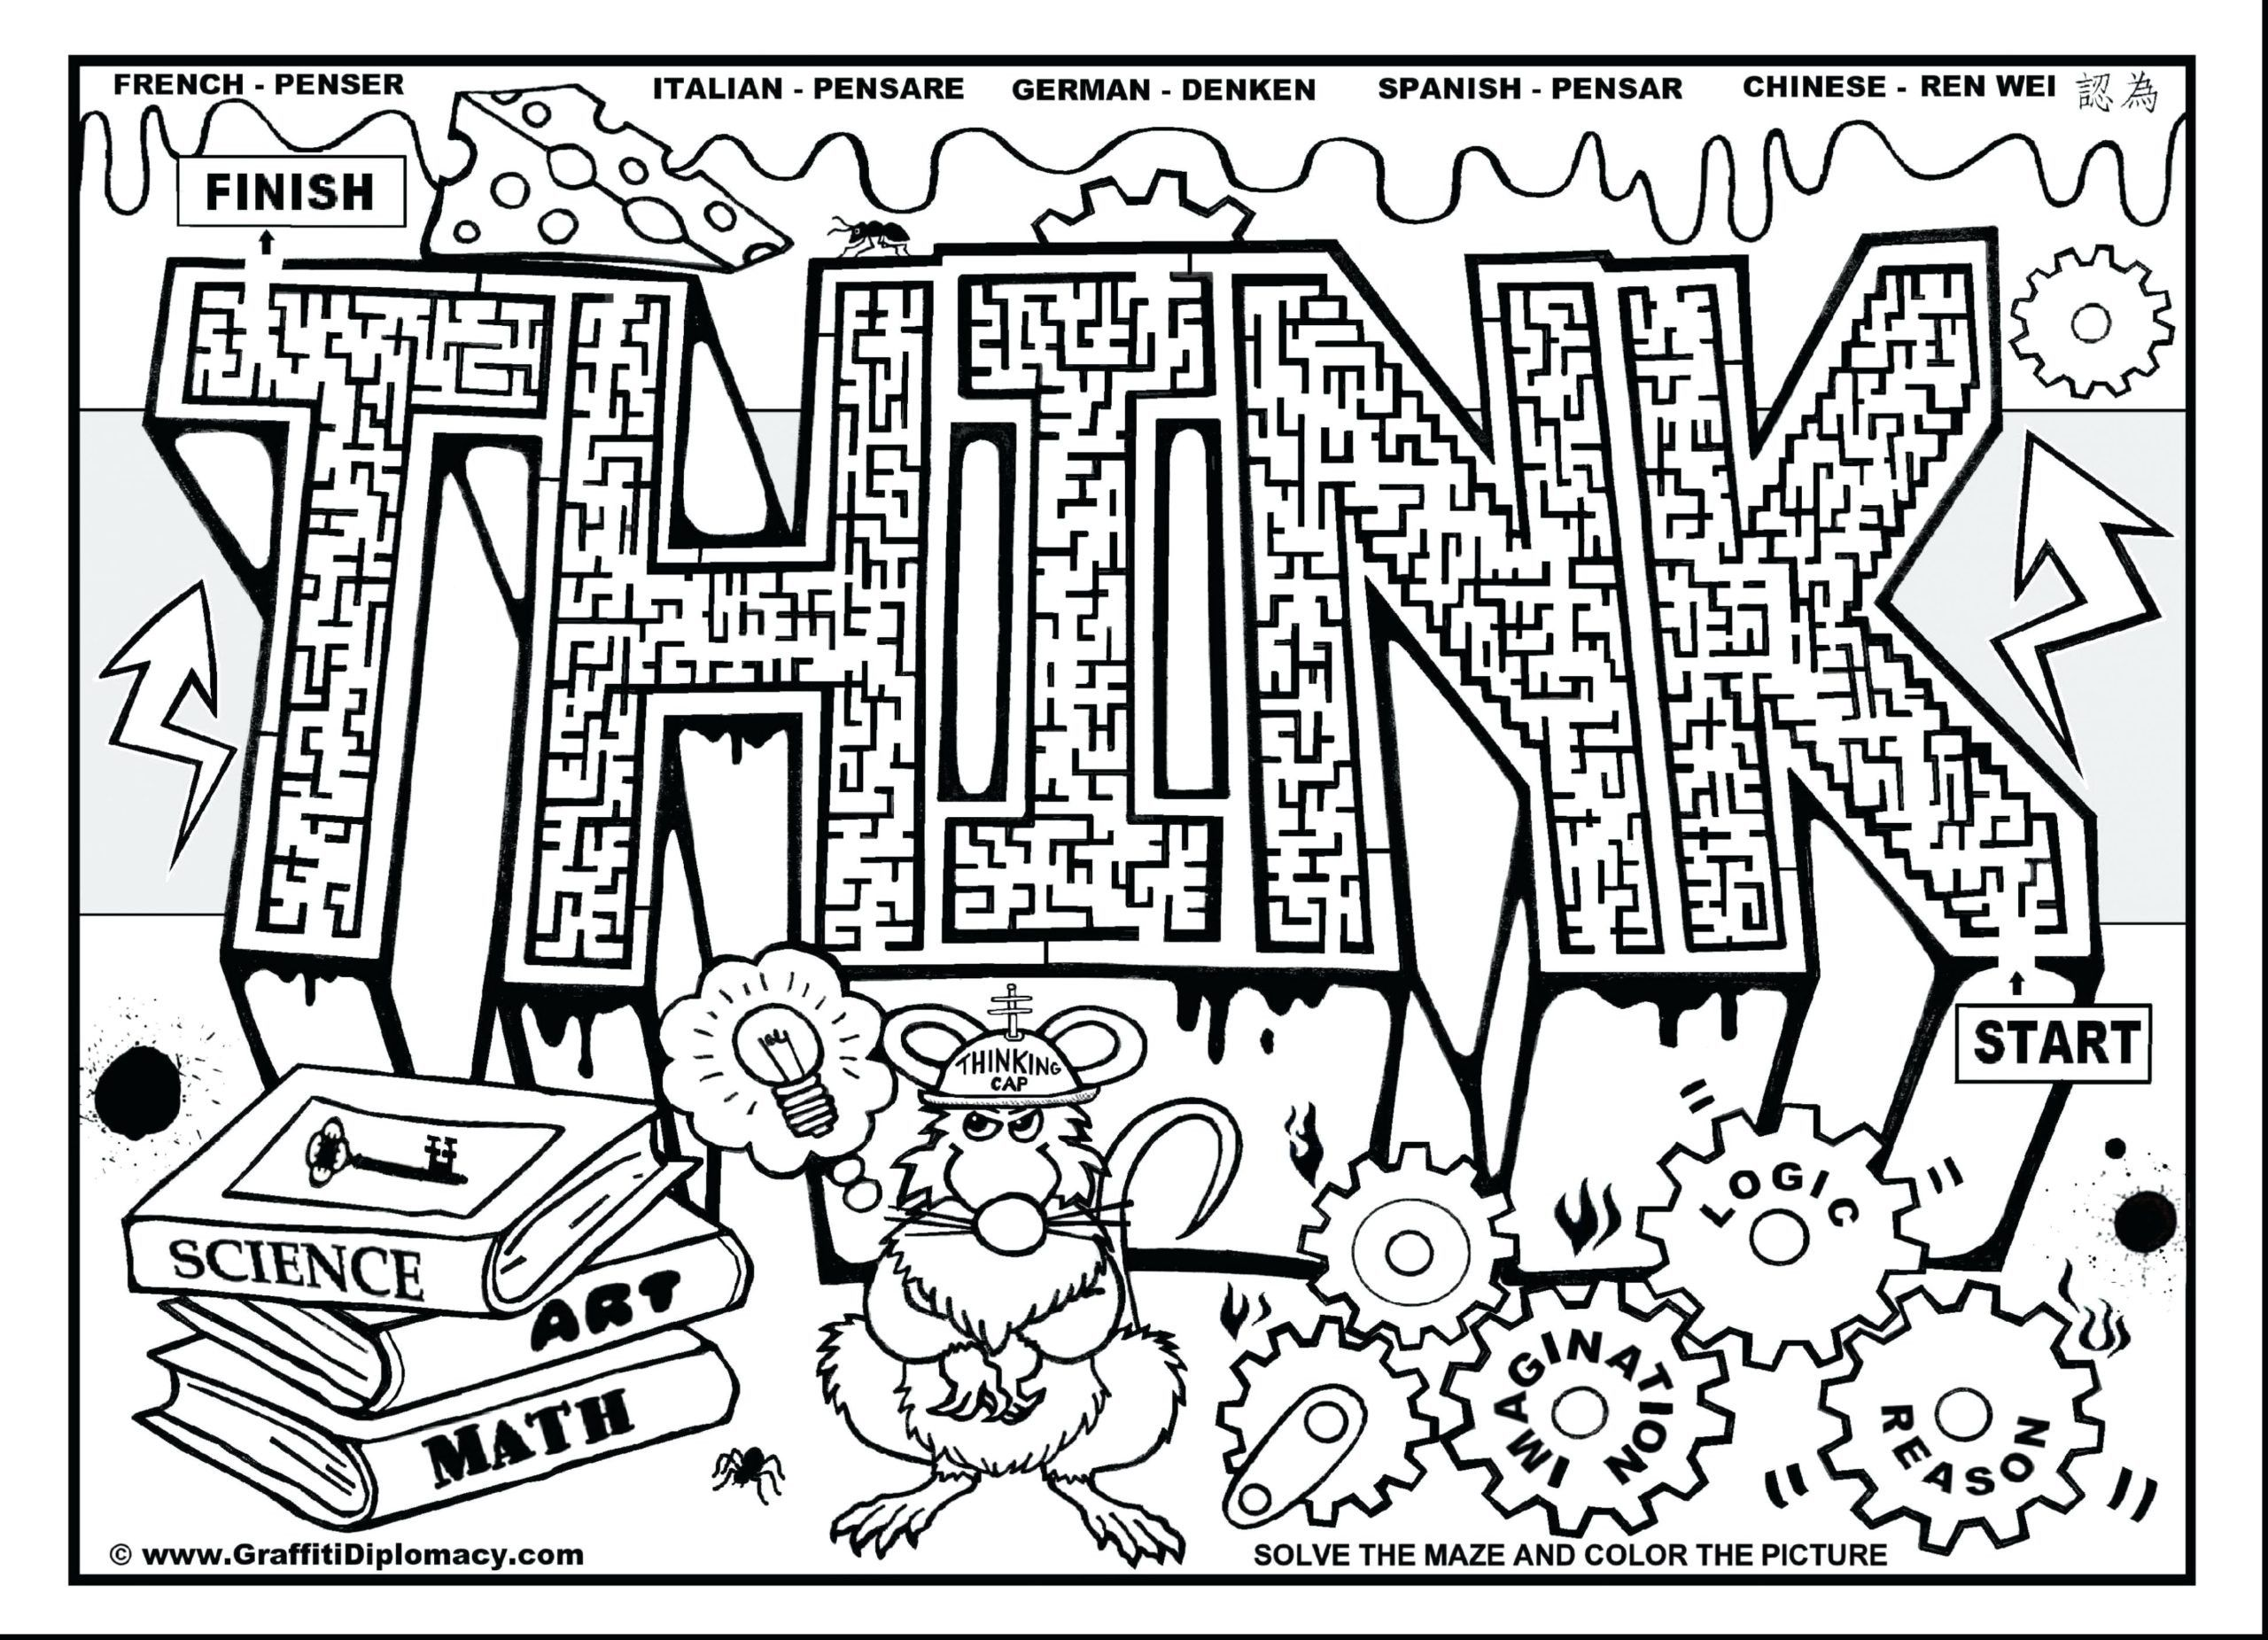 7 Ocean Animals Tracing Worksheets Pentagon Worksheets For Preschool Math College Kids Worksh School Coloring Pages Abstract Coloring Pages Coloring Pages